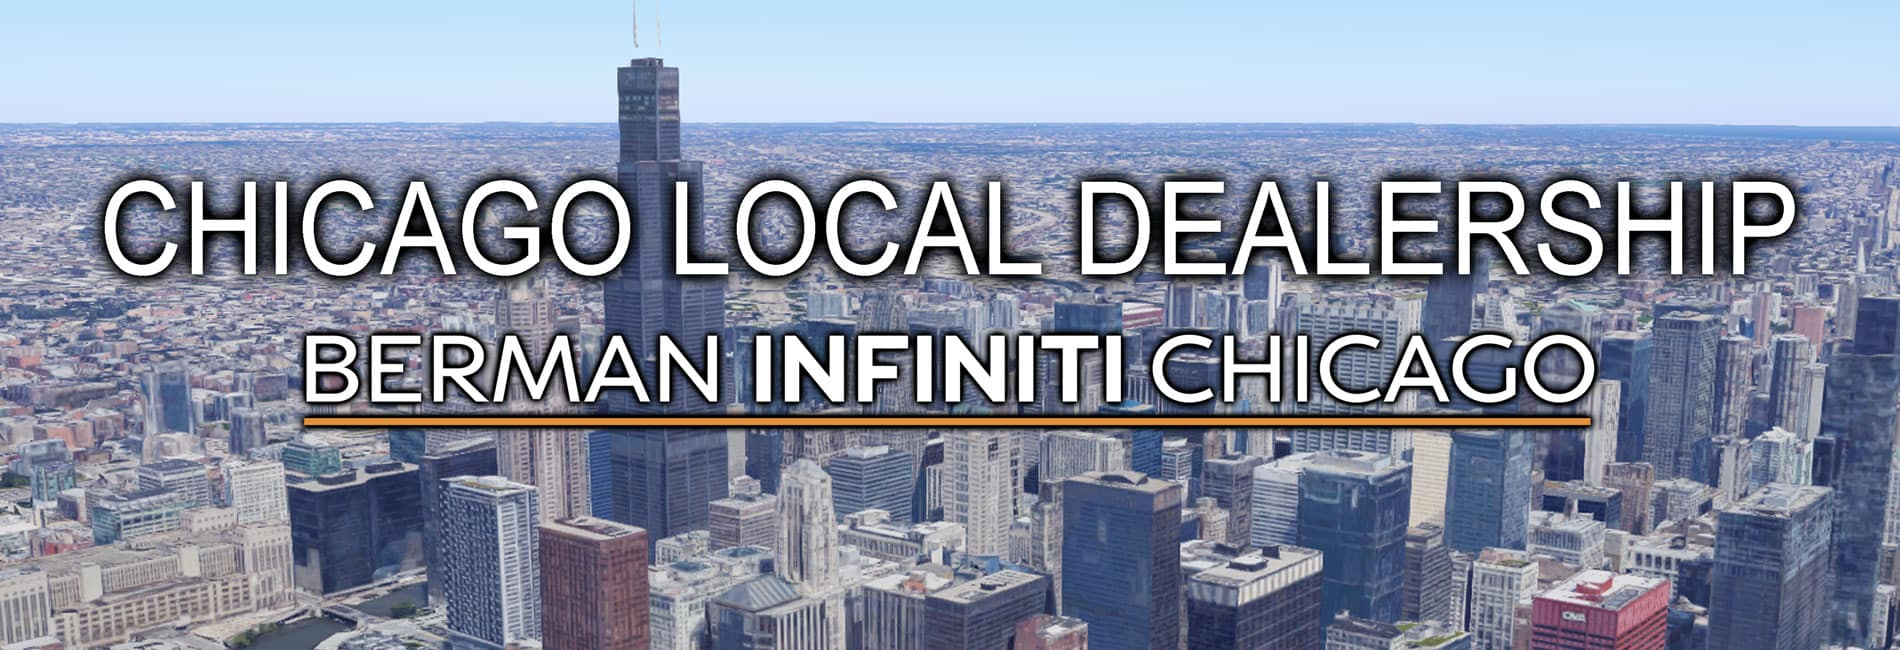 Berman INFINITI of Chicago Chicago Local Dealership